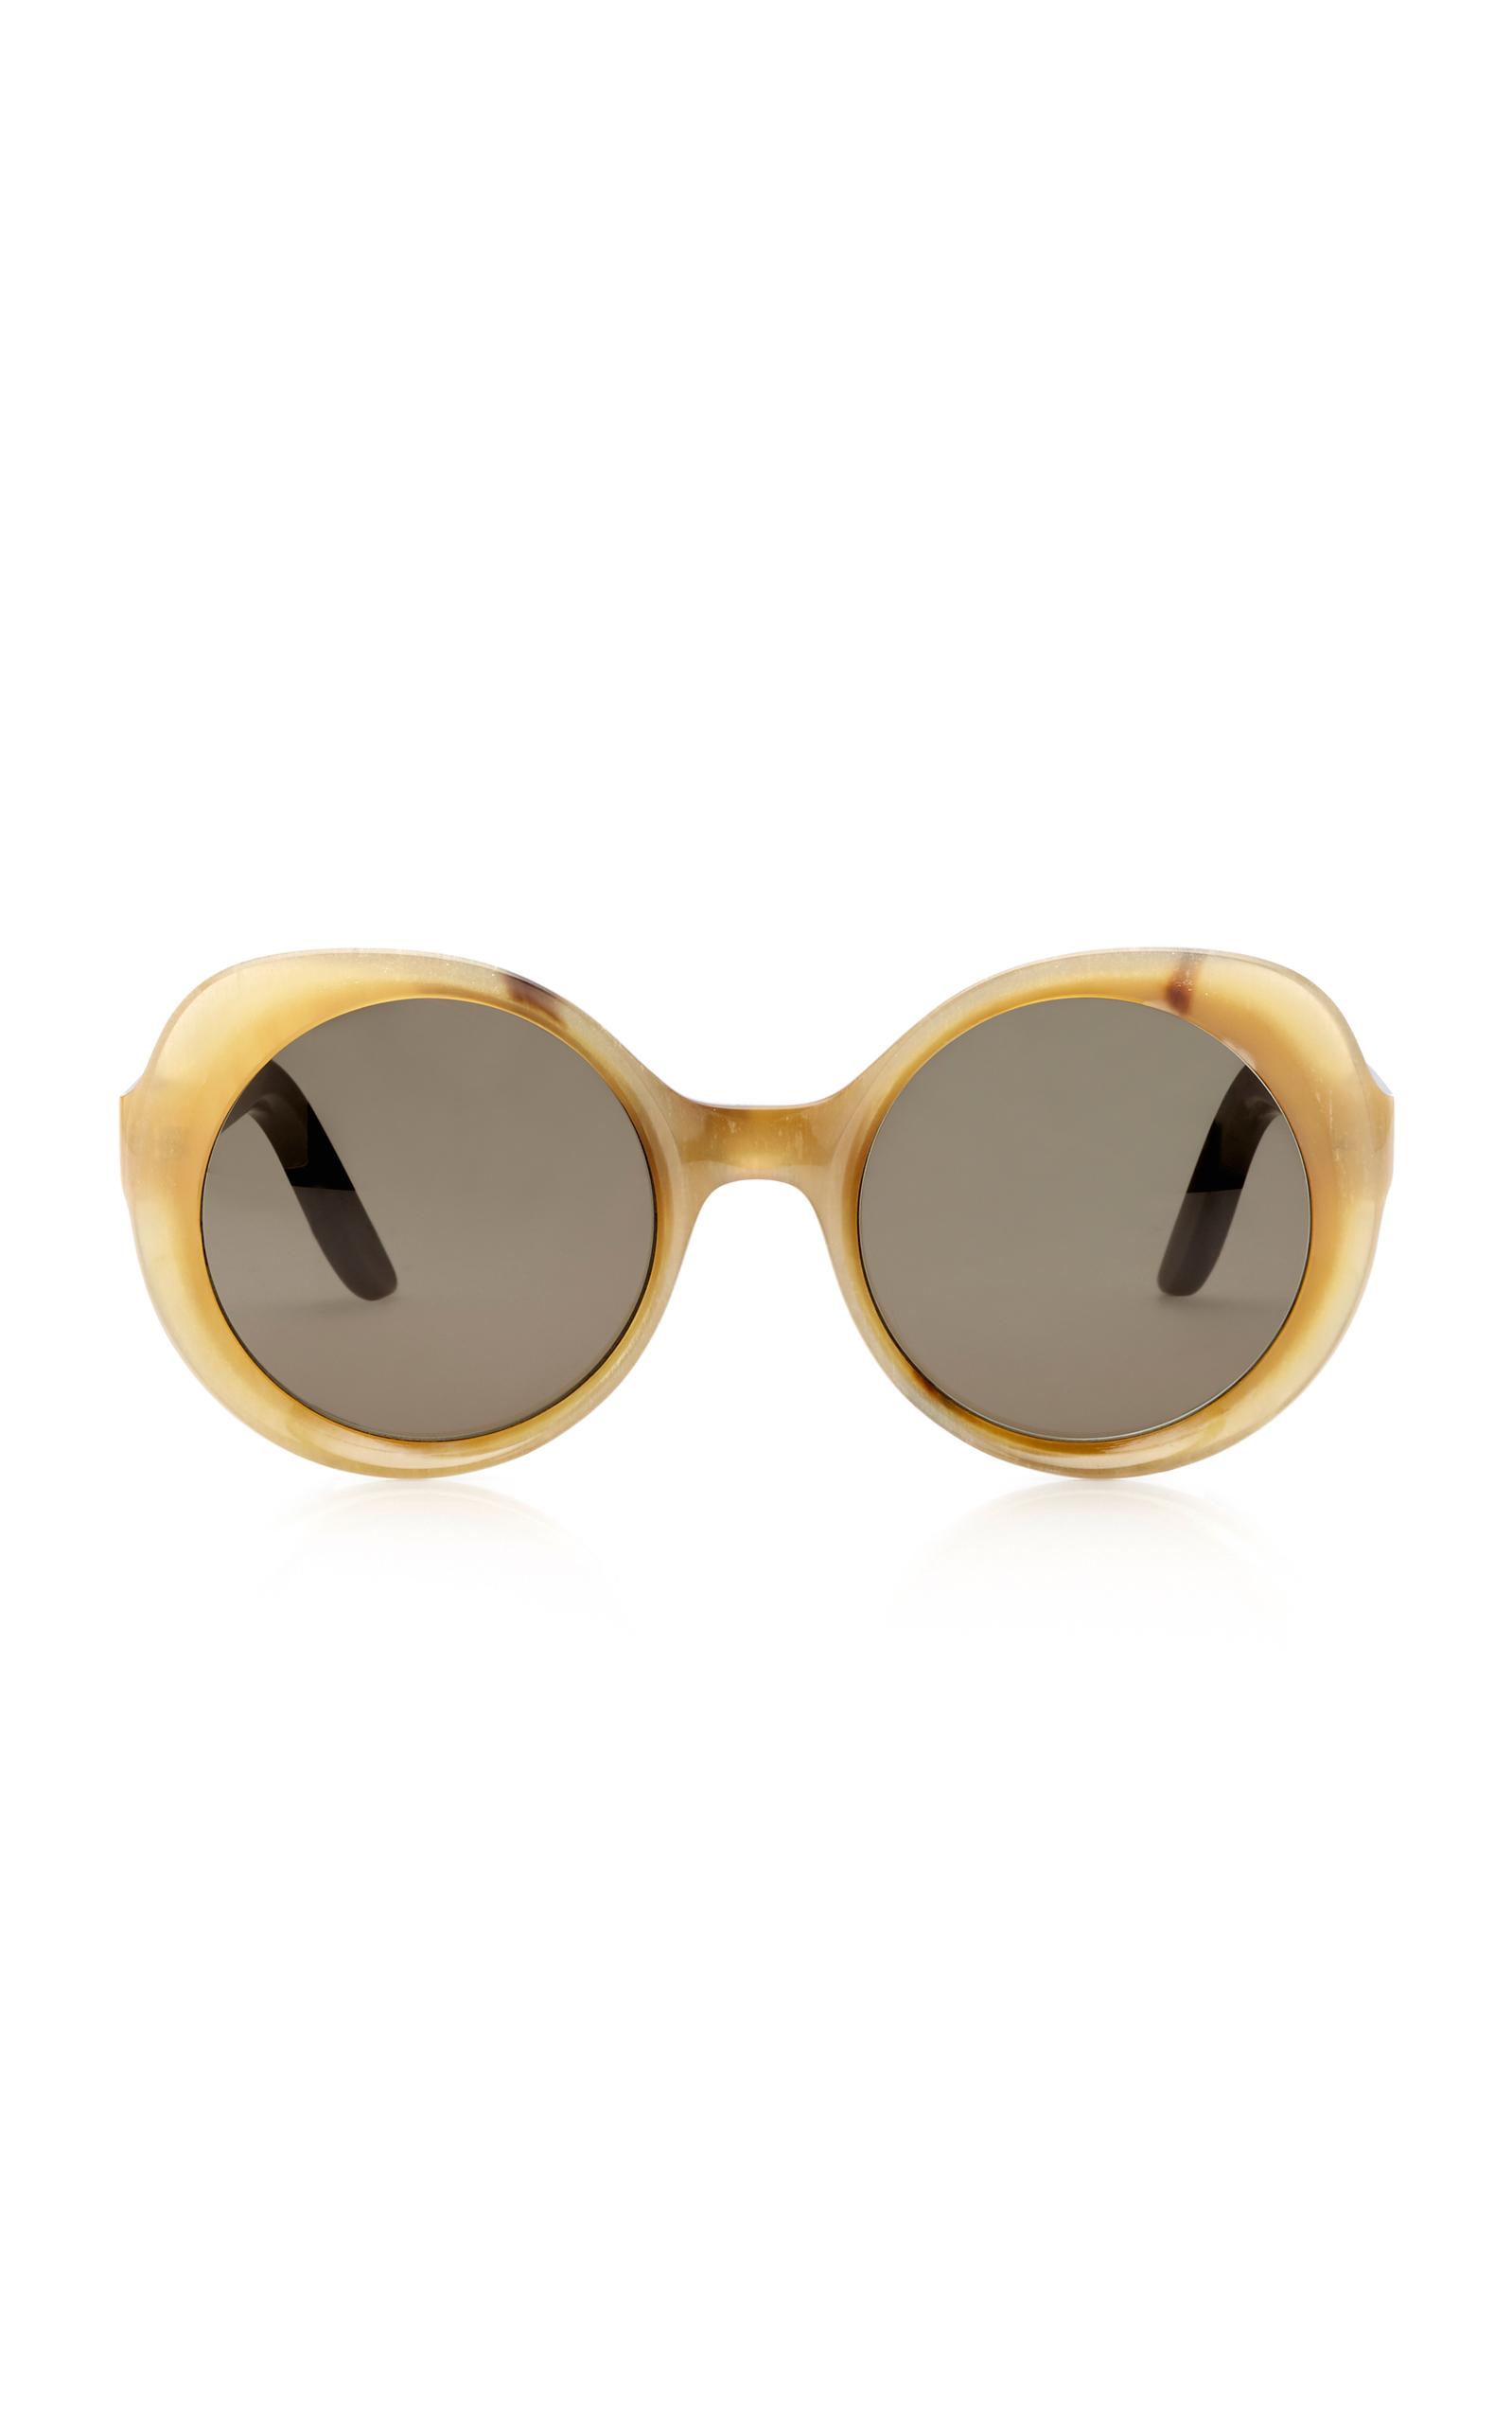 LAPIMA Carlota Oversized Round-Frame Sunglasses in Neutral